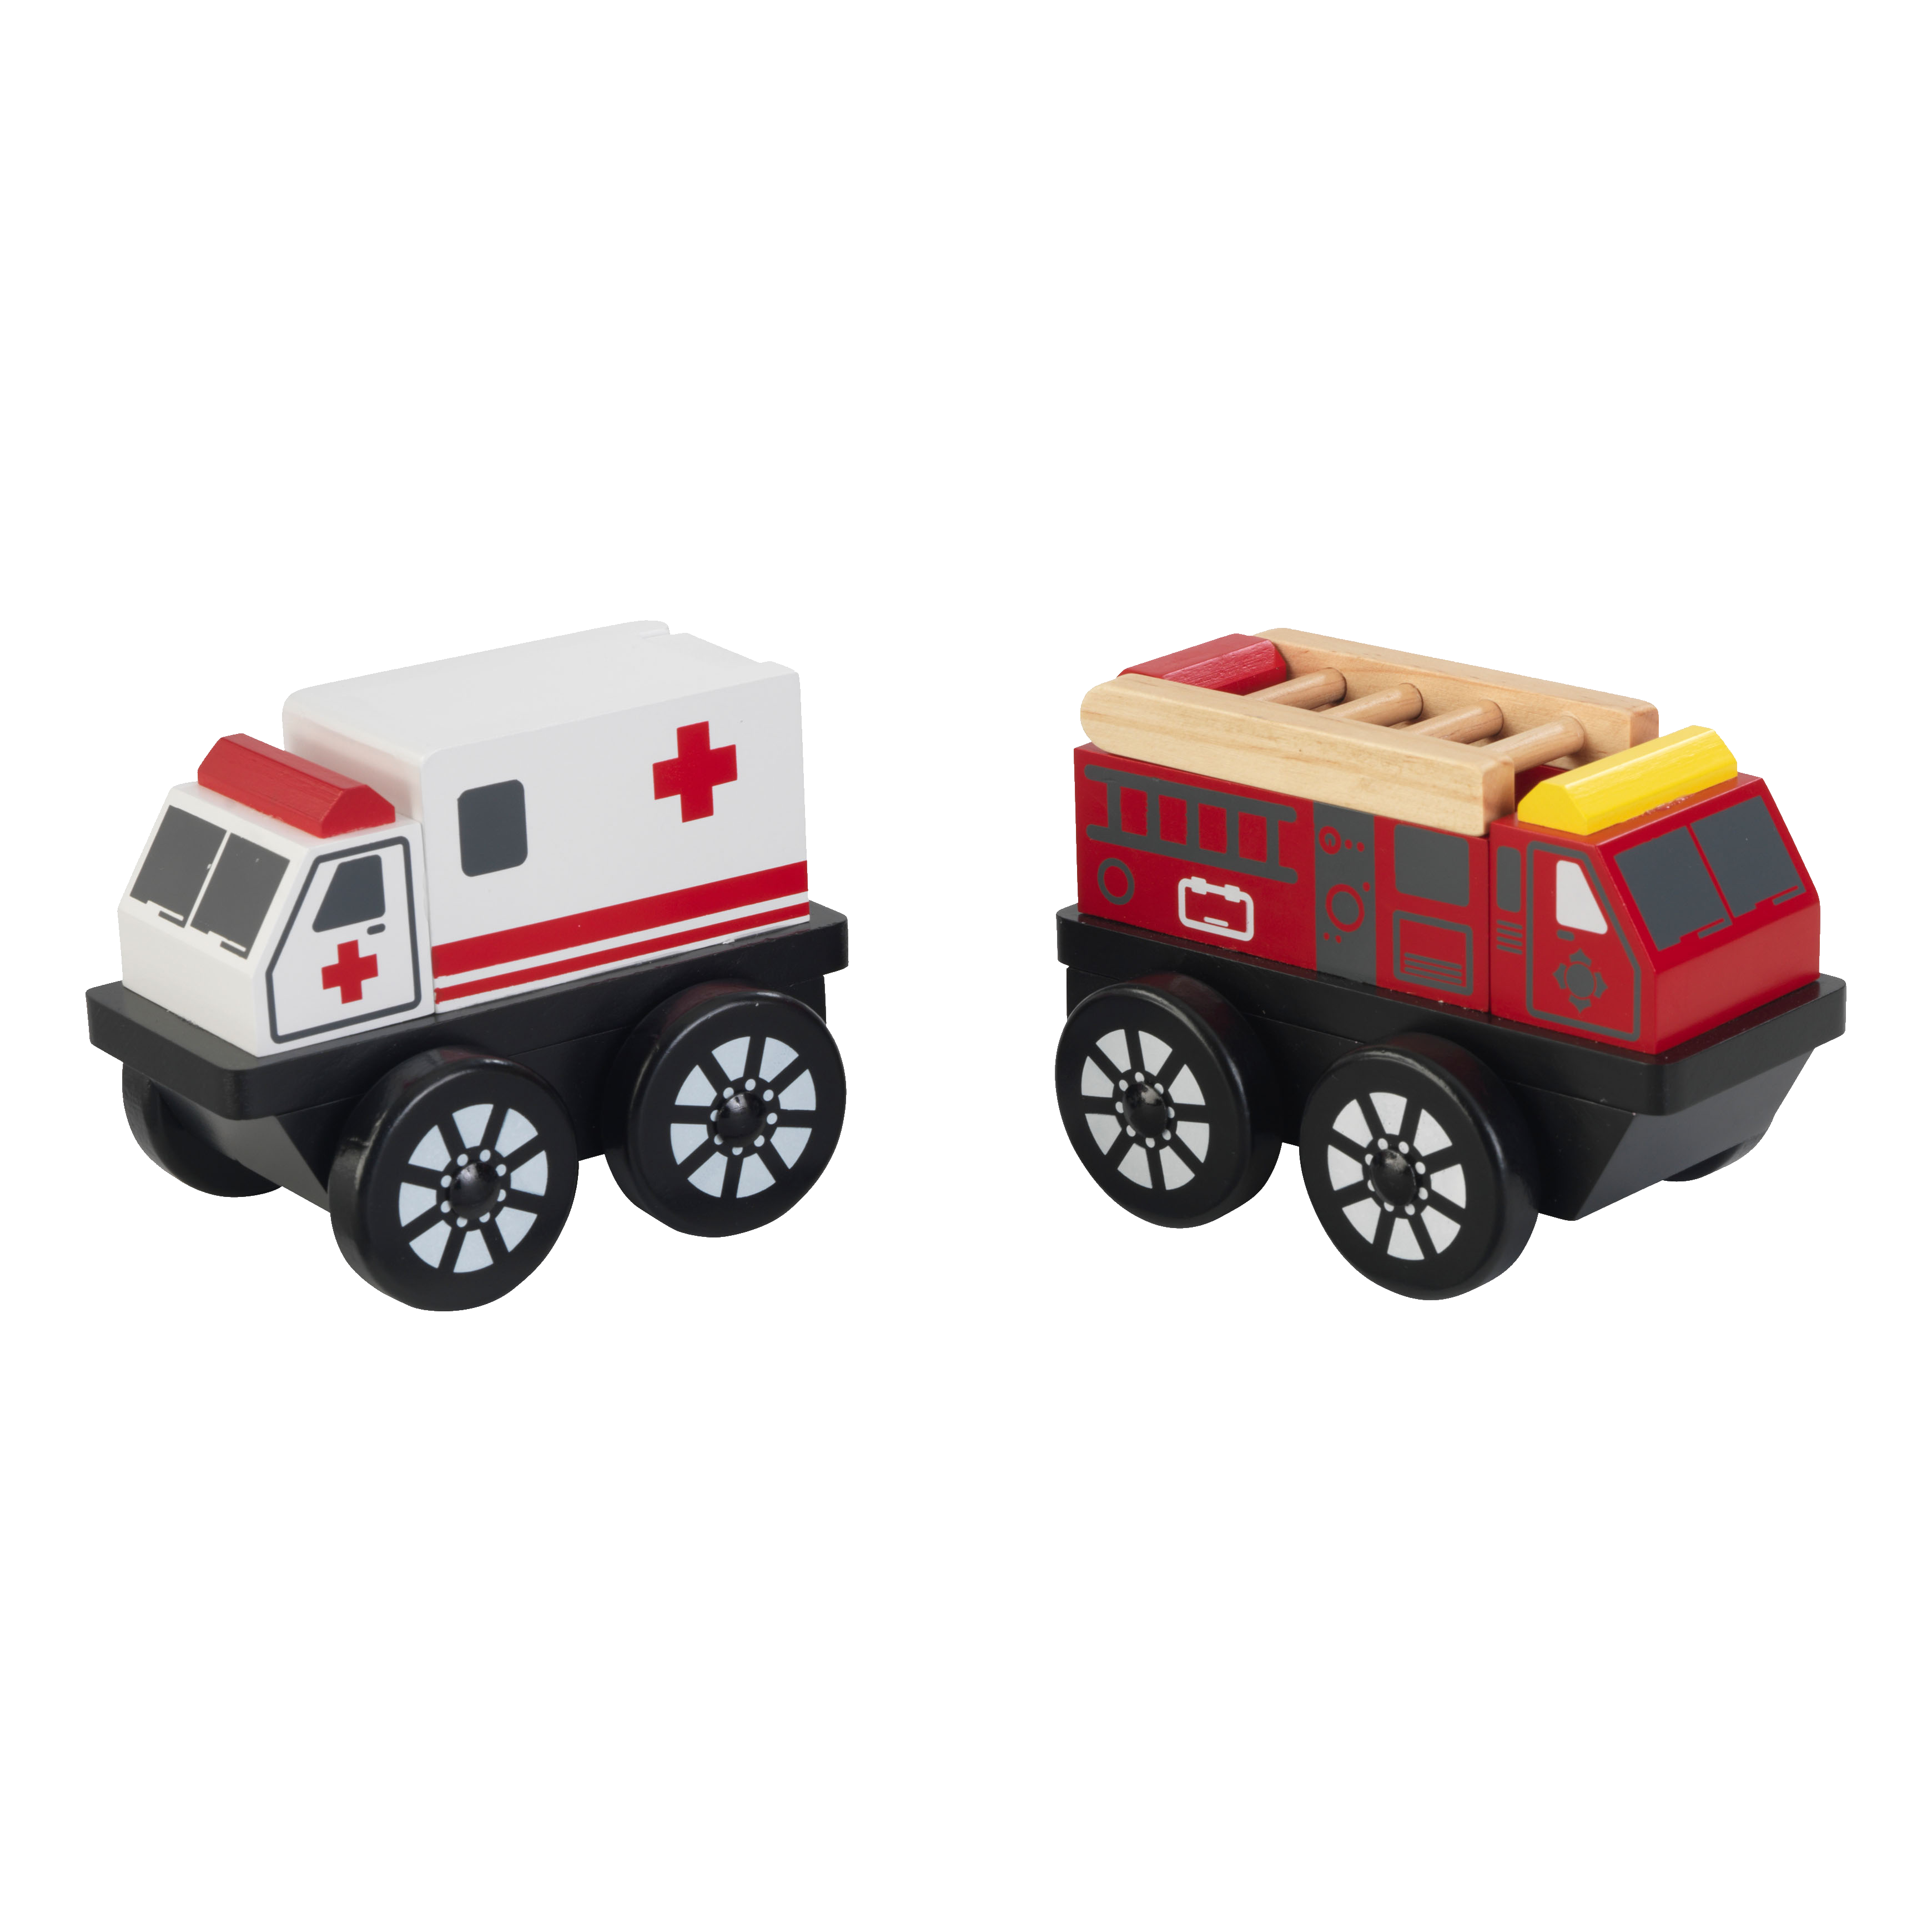 KidKraft Vehicle Play Set Rescue by KidKraft